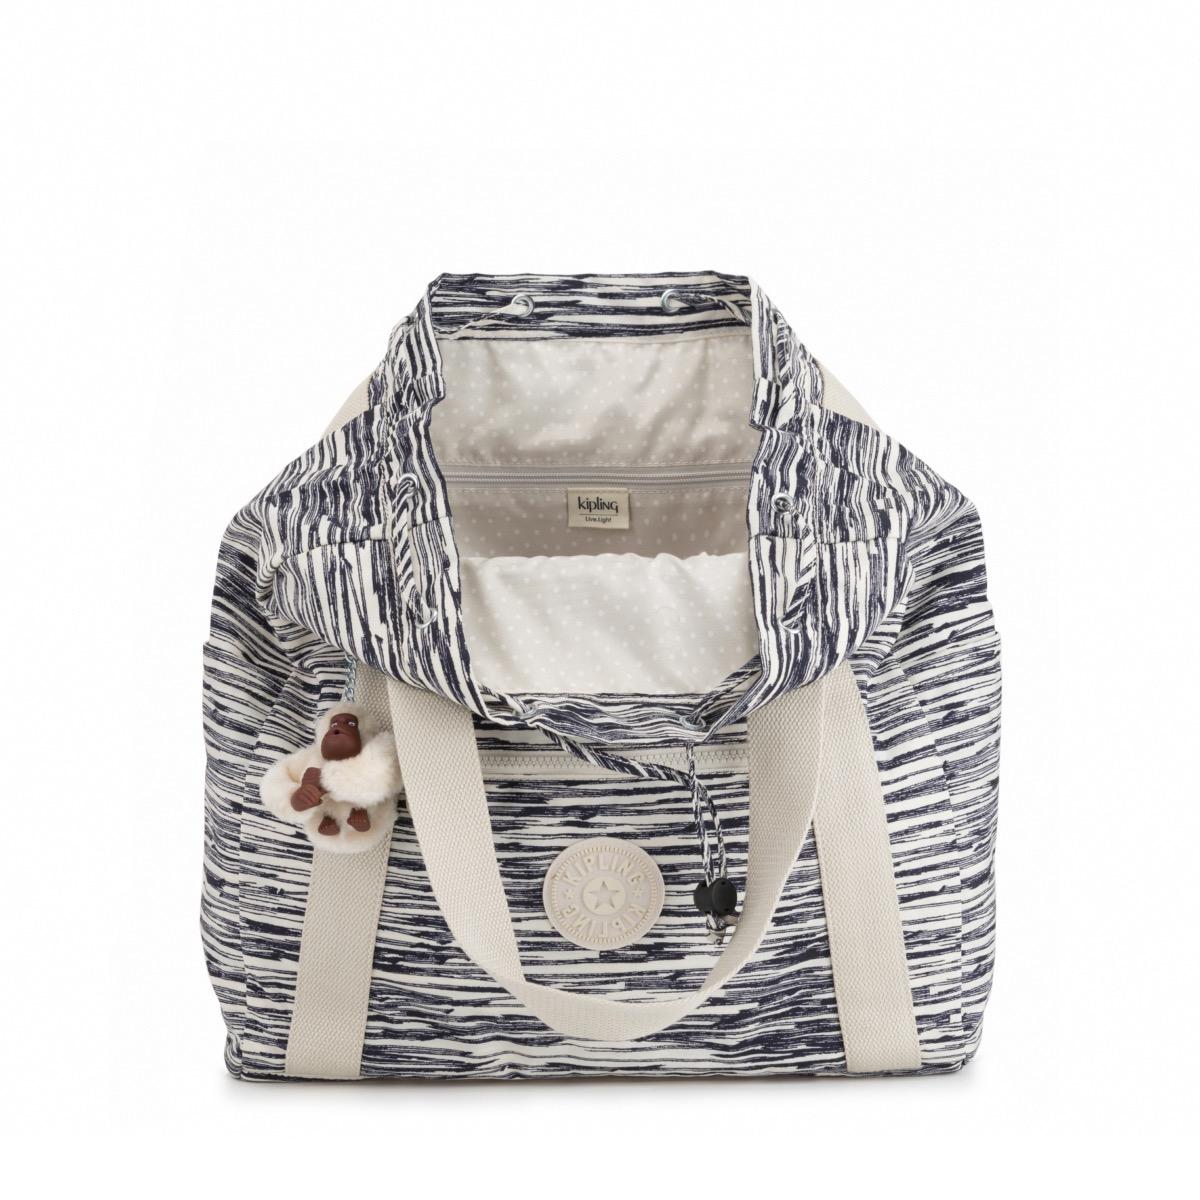 Kipling Art Backpack M with Monkey Keychain Scribbles Lines 6e0e6adb1b4d3